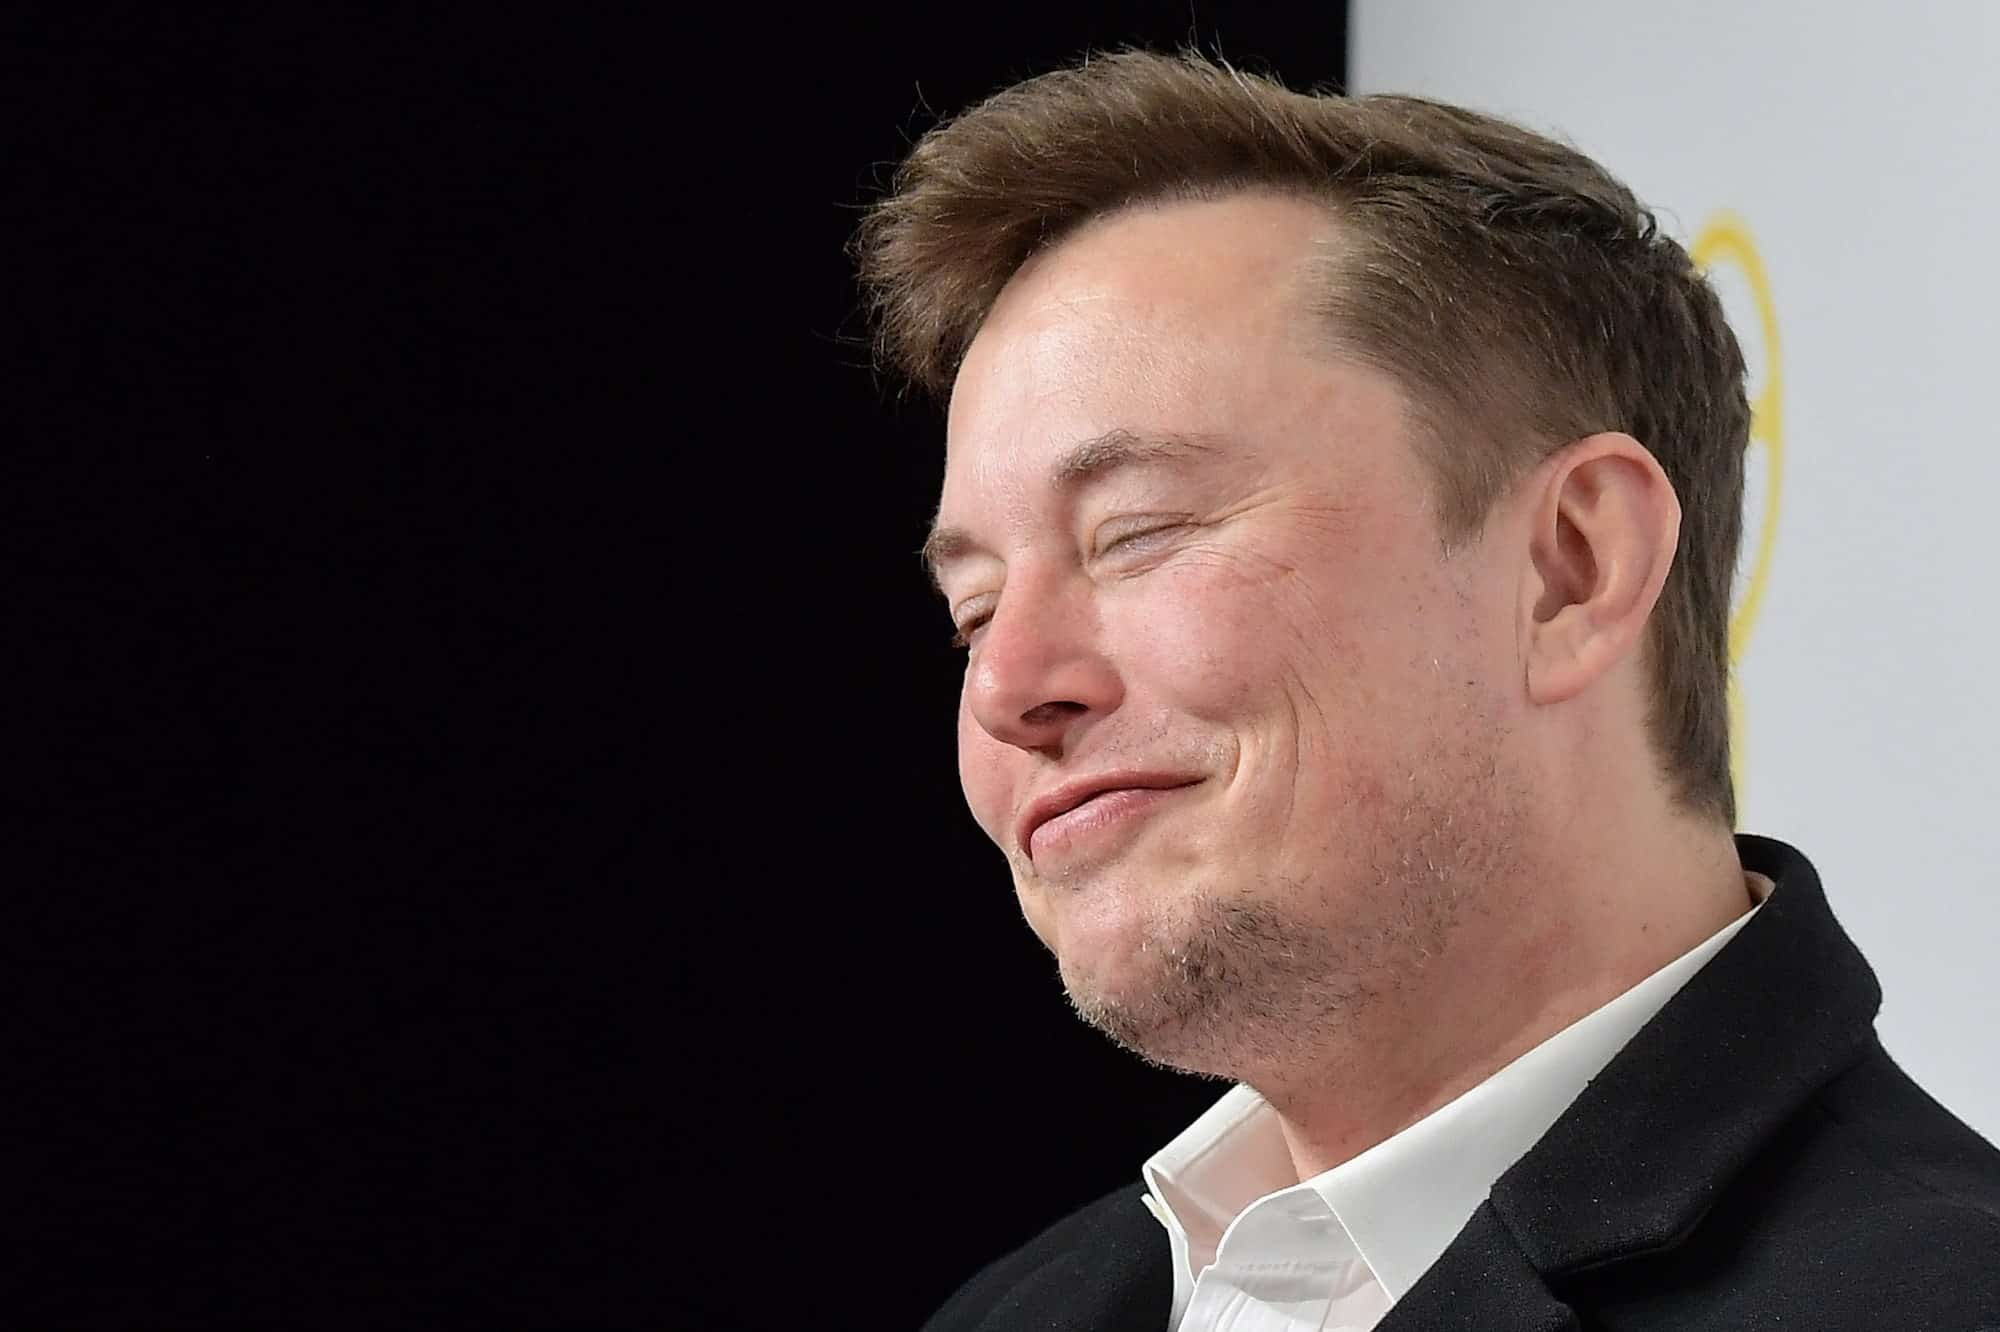 Elon Musk Reopens Tesla Fremont Factory Despite County's Rules